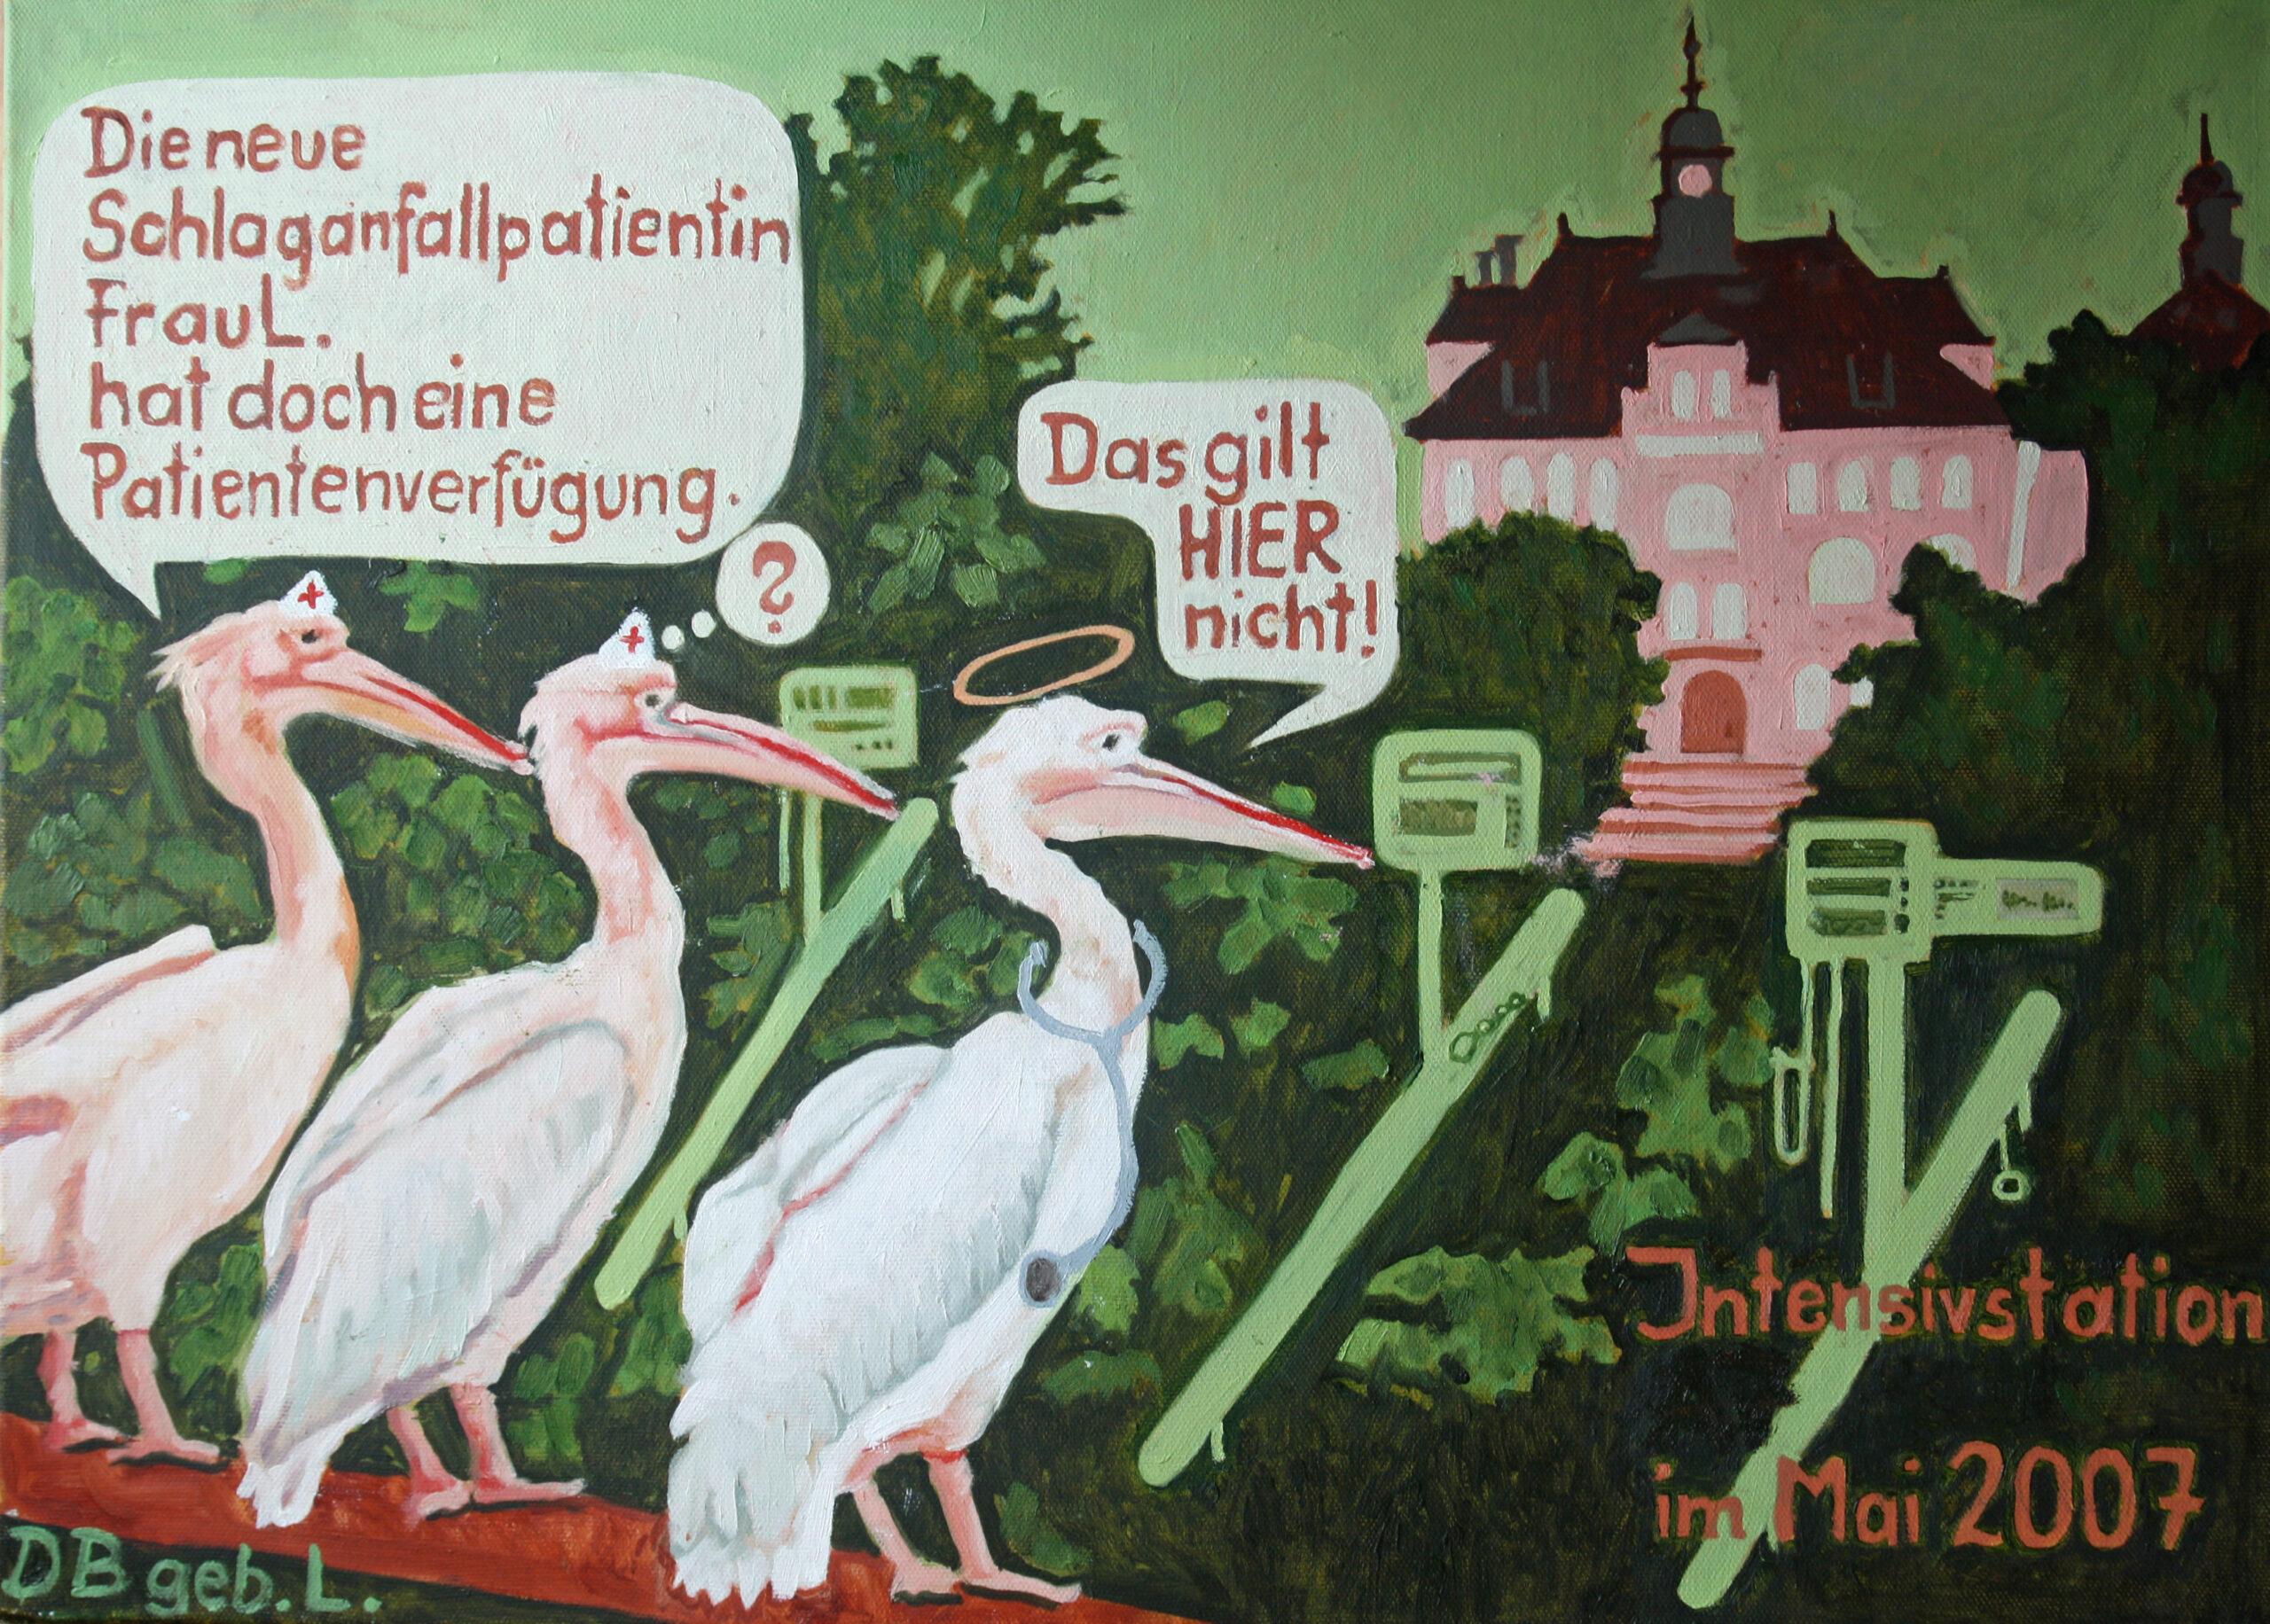 o.T. von D.B.(Krankenhaus Görlitz), geb. L., 50x70, 2014